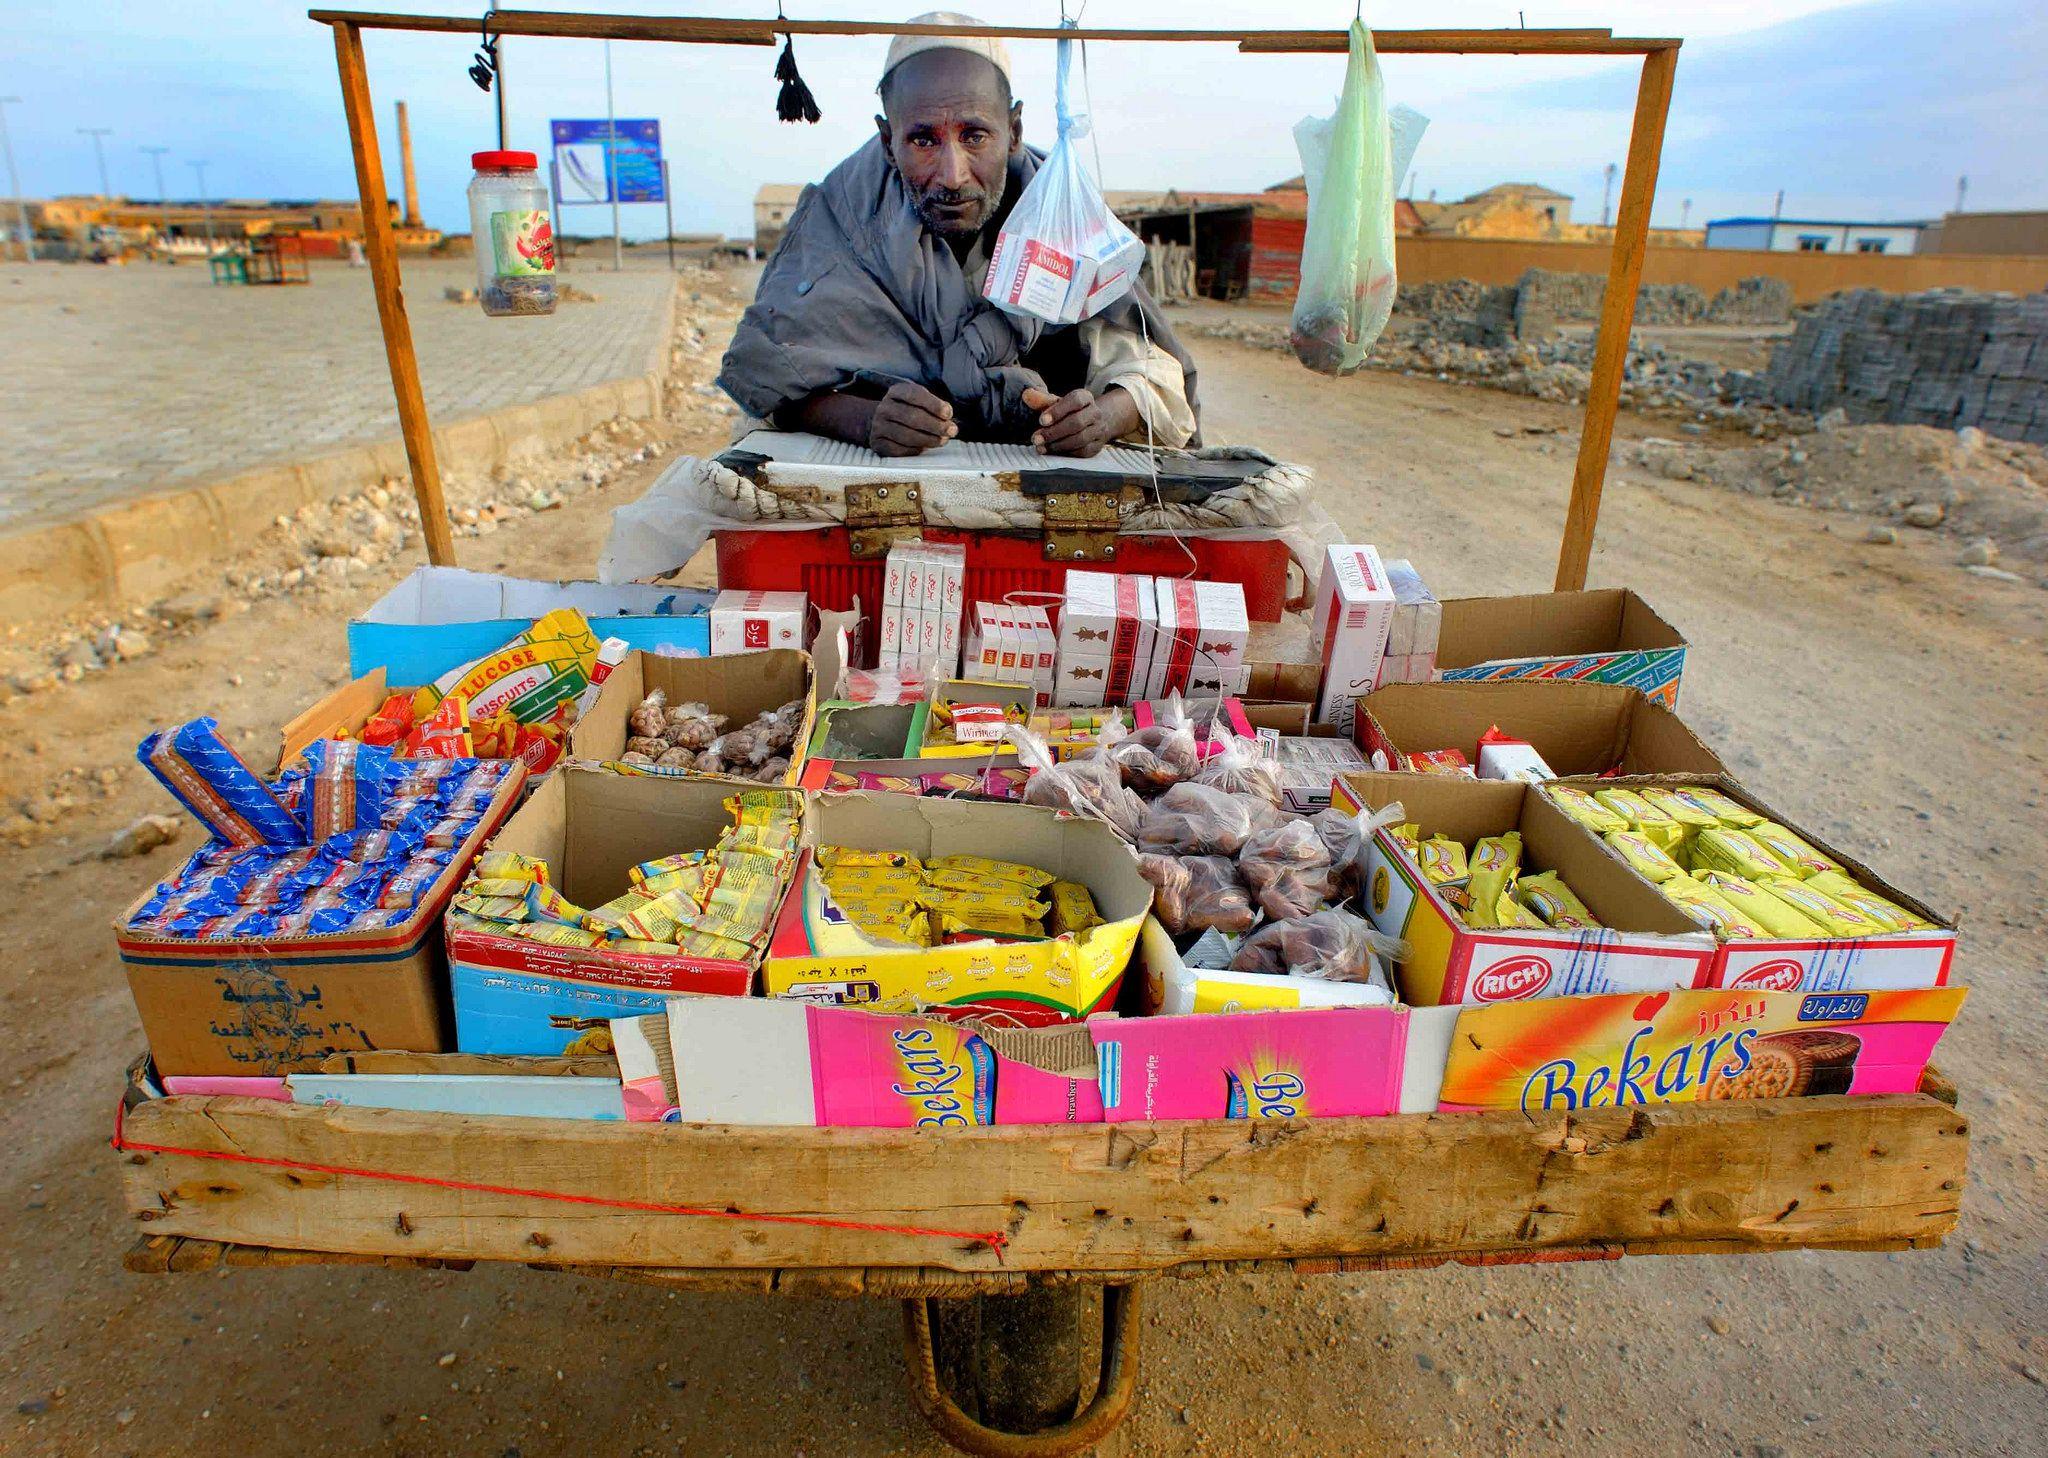 https://flic.kr/p/joAzfr   Street vendor, Suakin, Sudan   More on www.christophecerisier.com